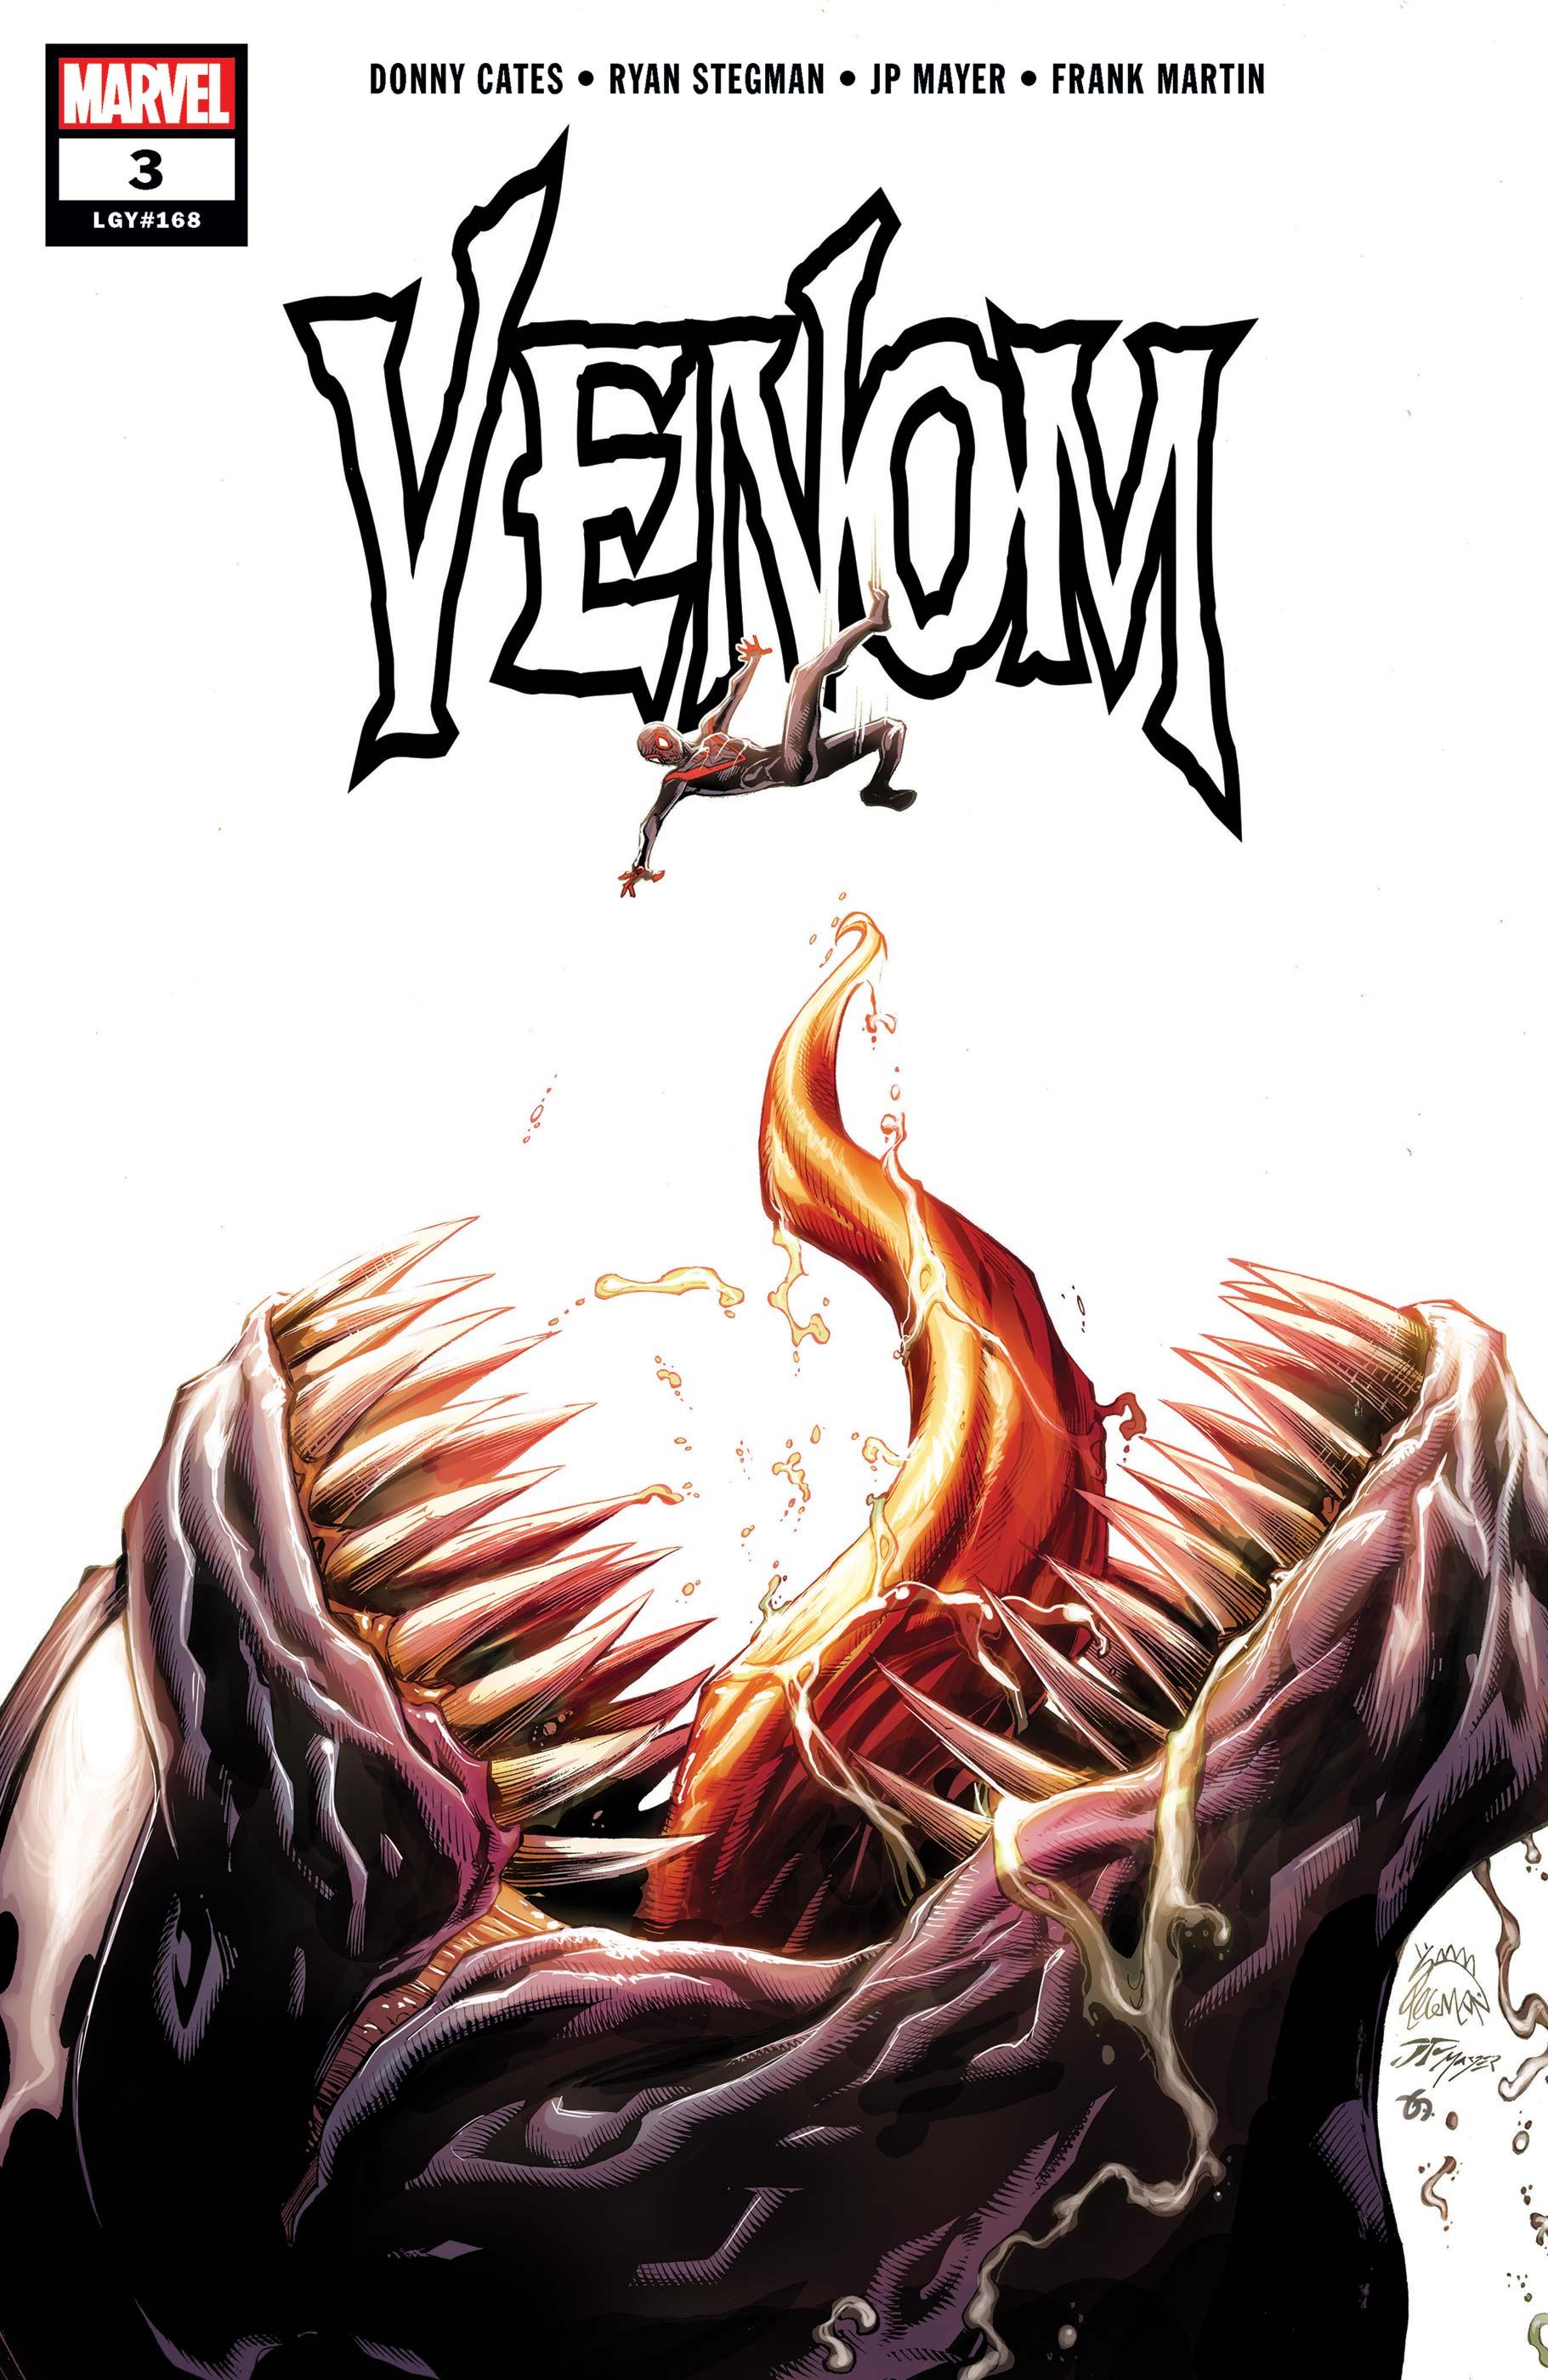 Venom (2018) #3